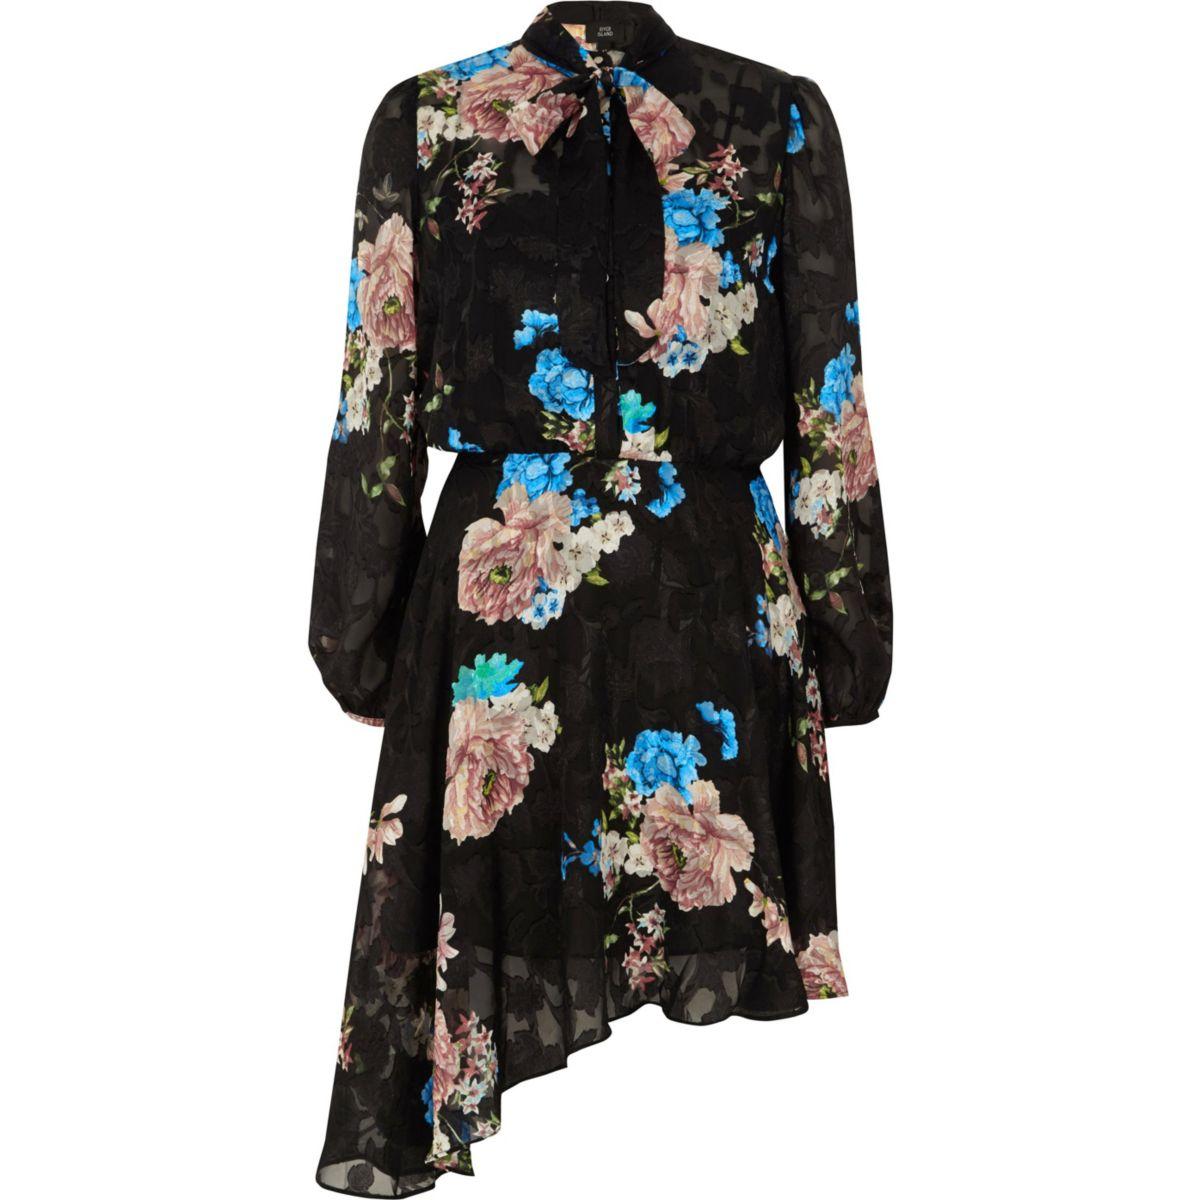 Black sheer lace floral print tie neck dress